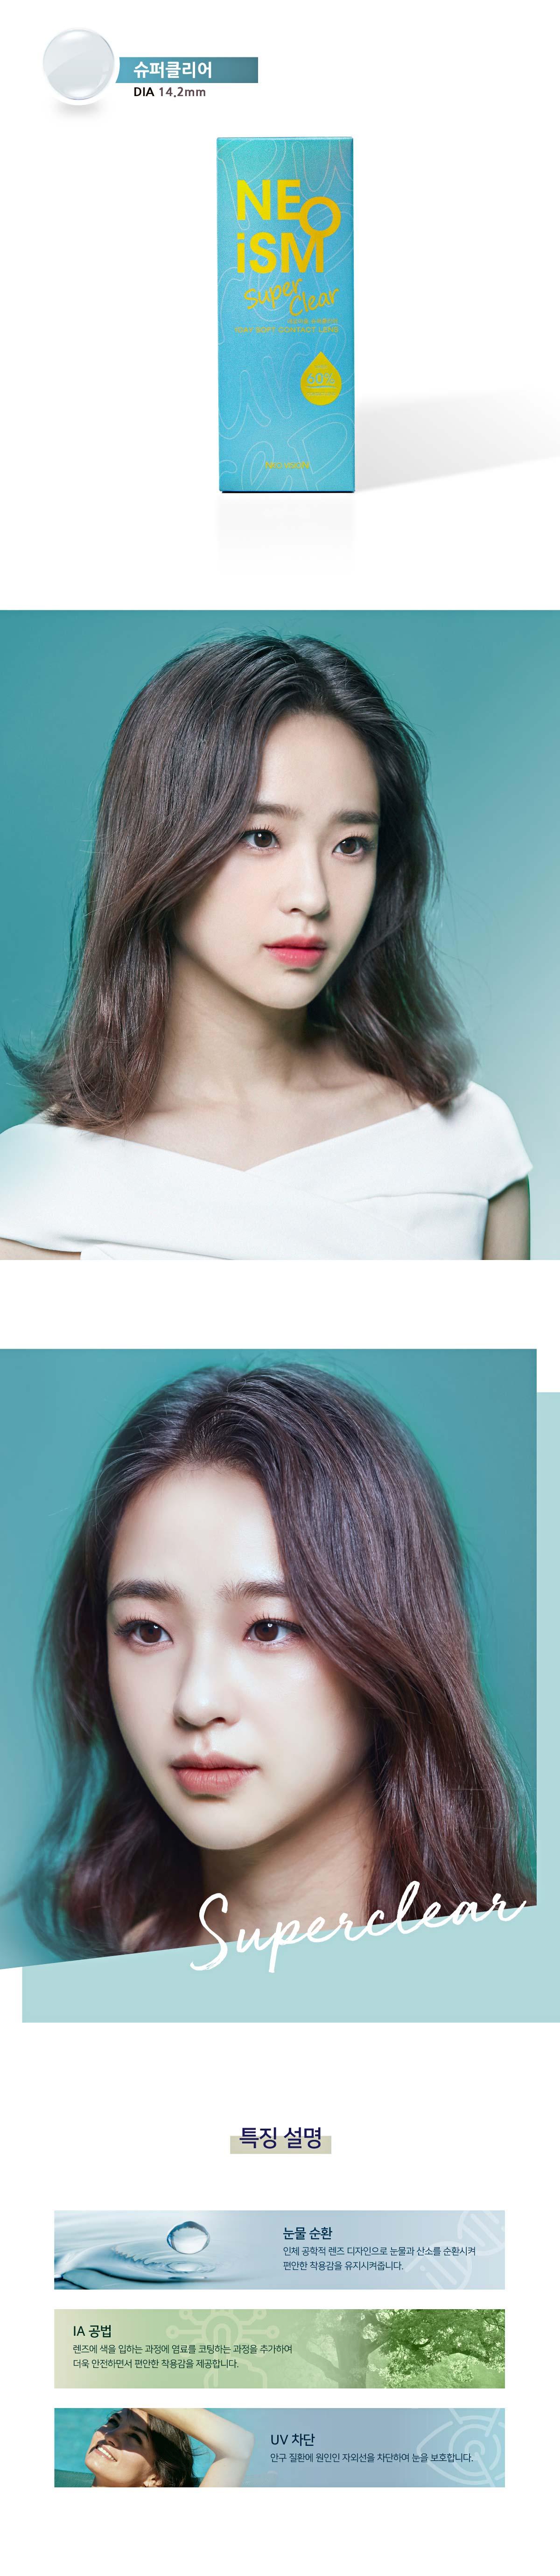 neo-ism-super-clear-korean-contacts-lenses2.jpg